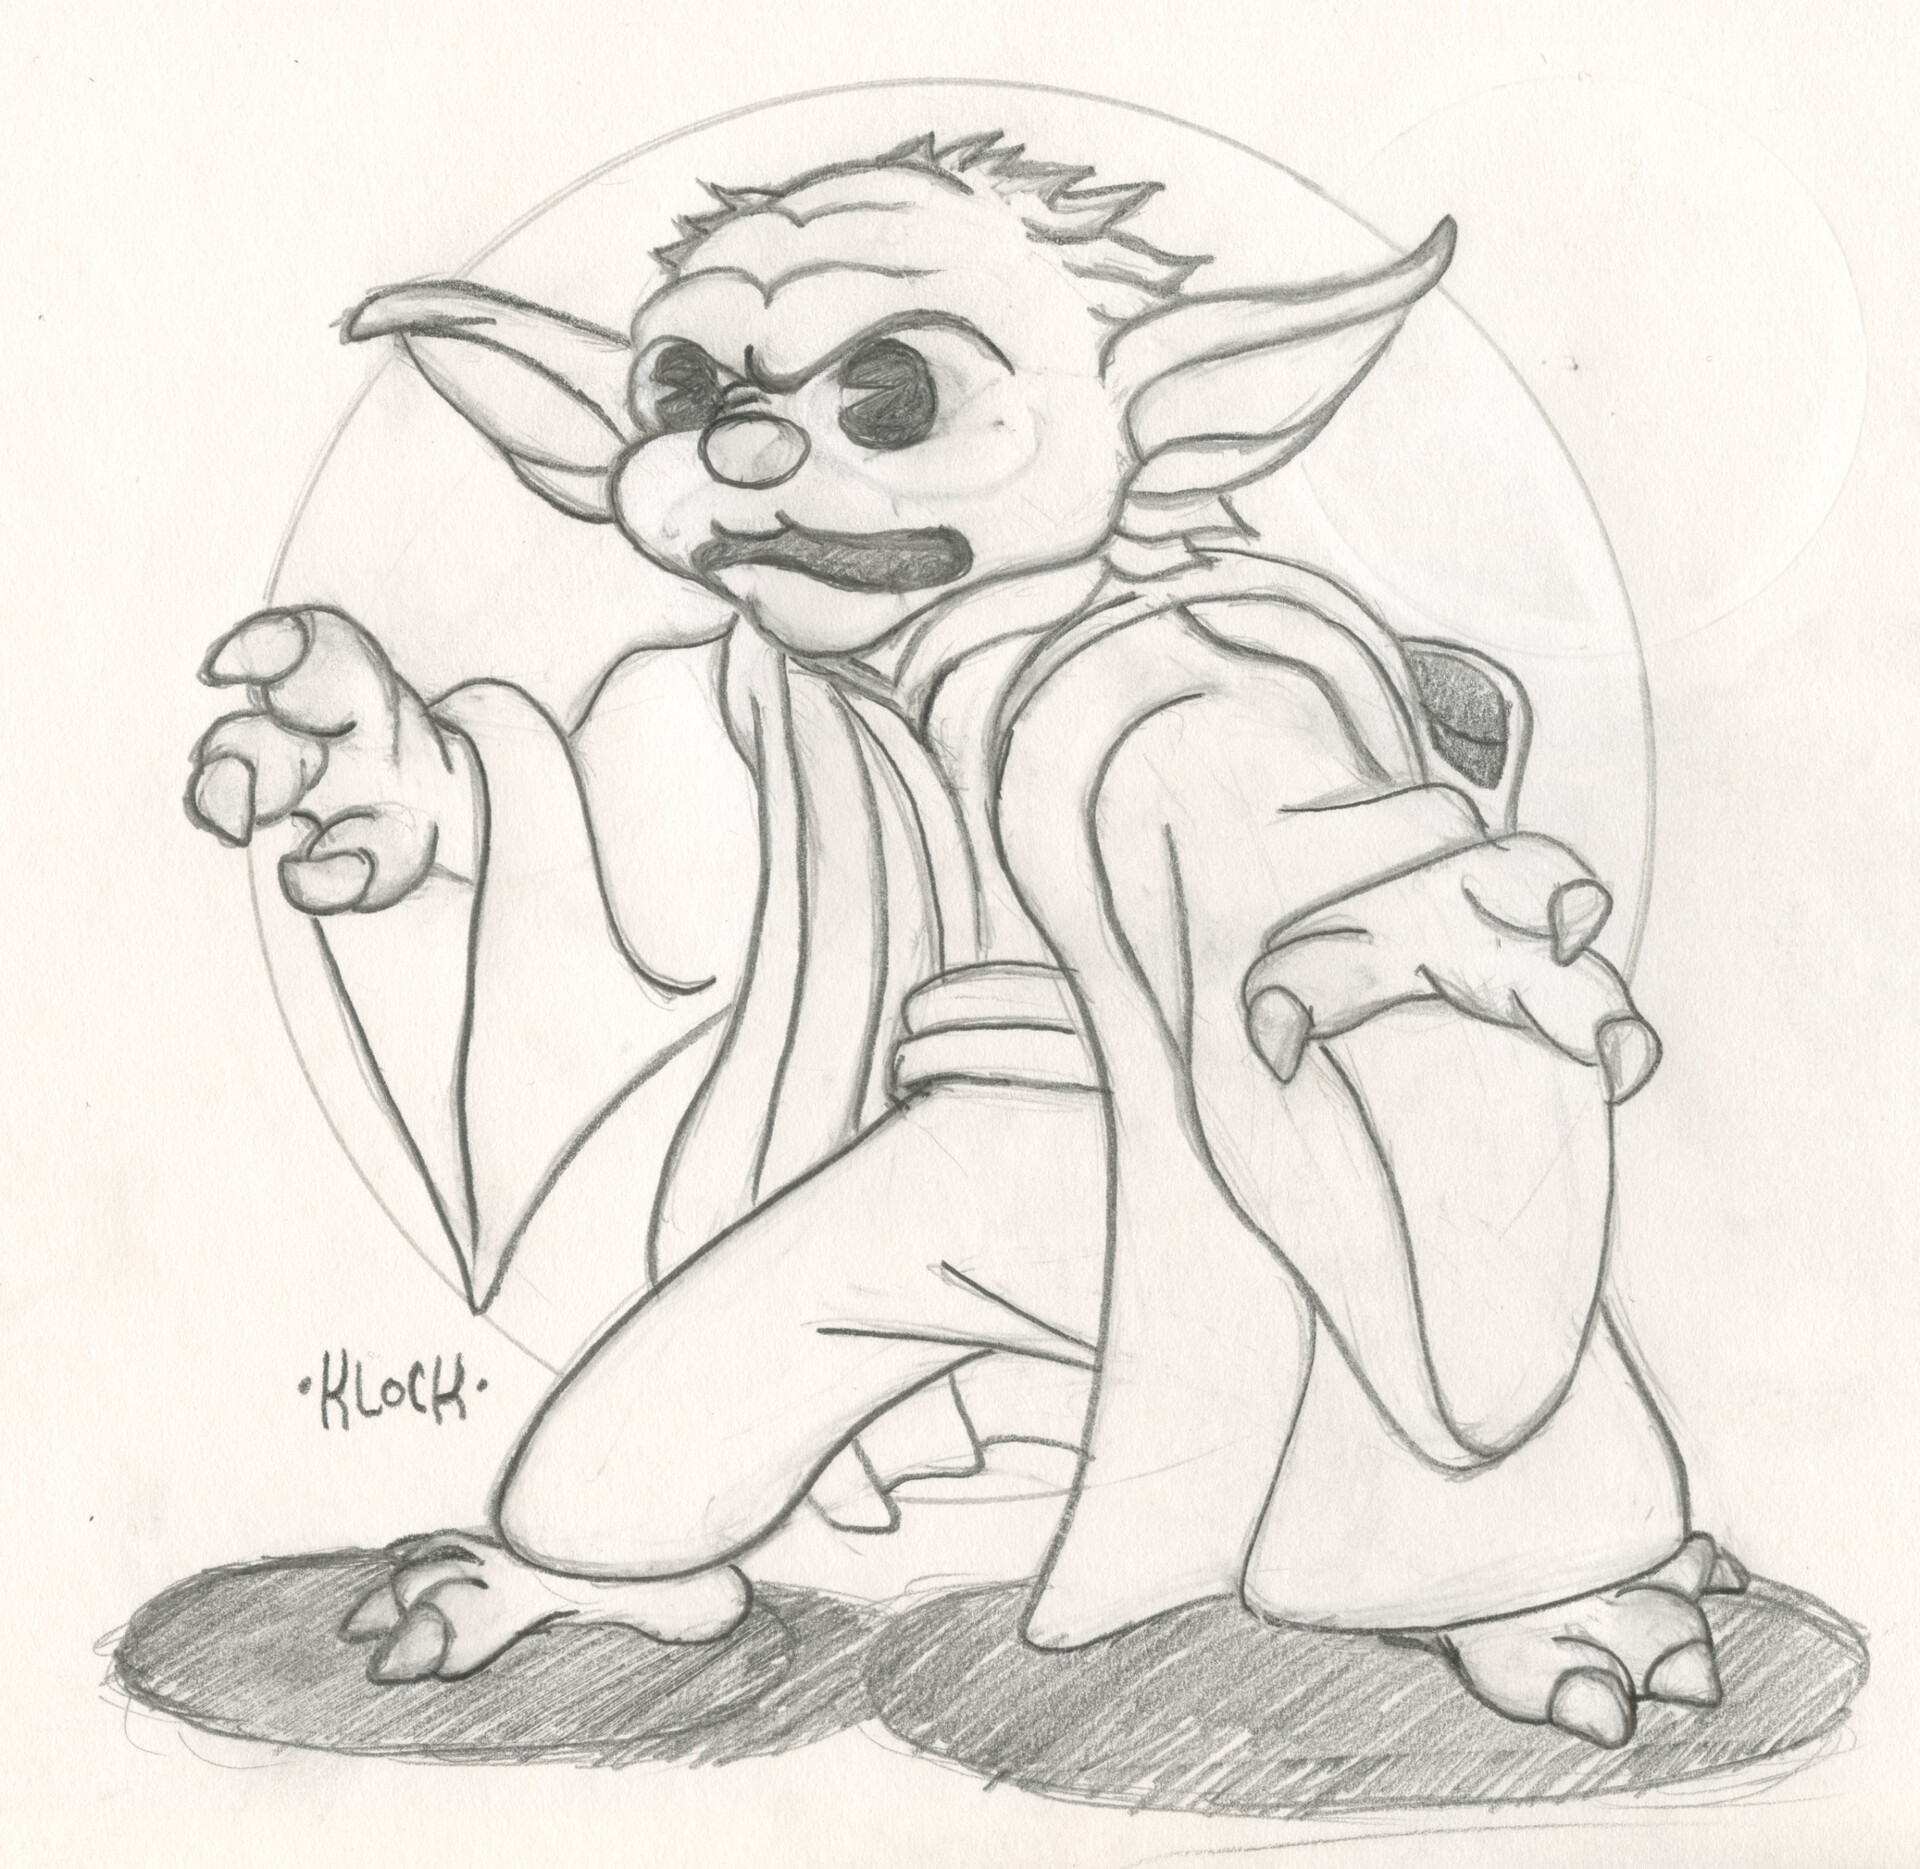 Retro Yoda Sketch